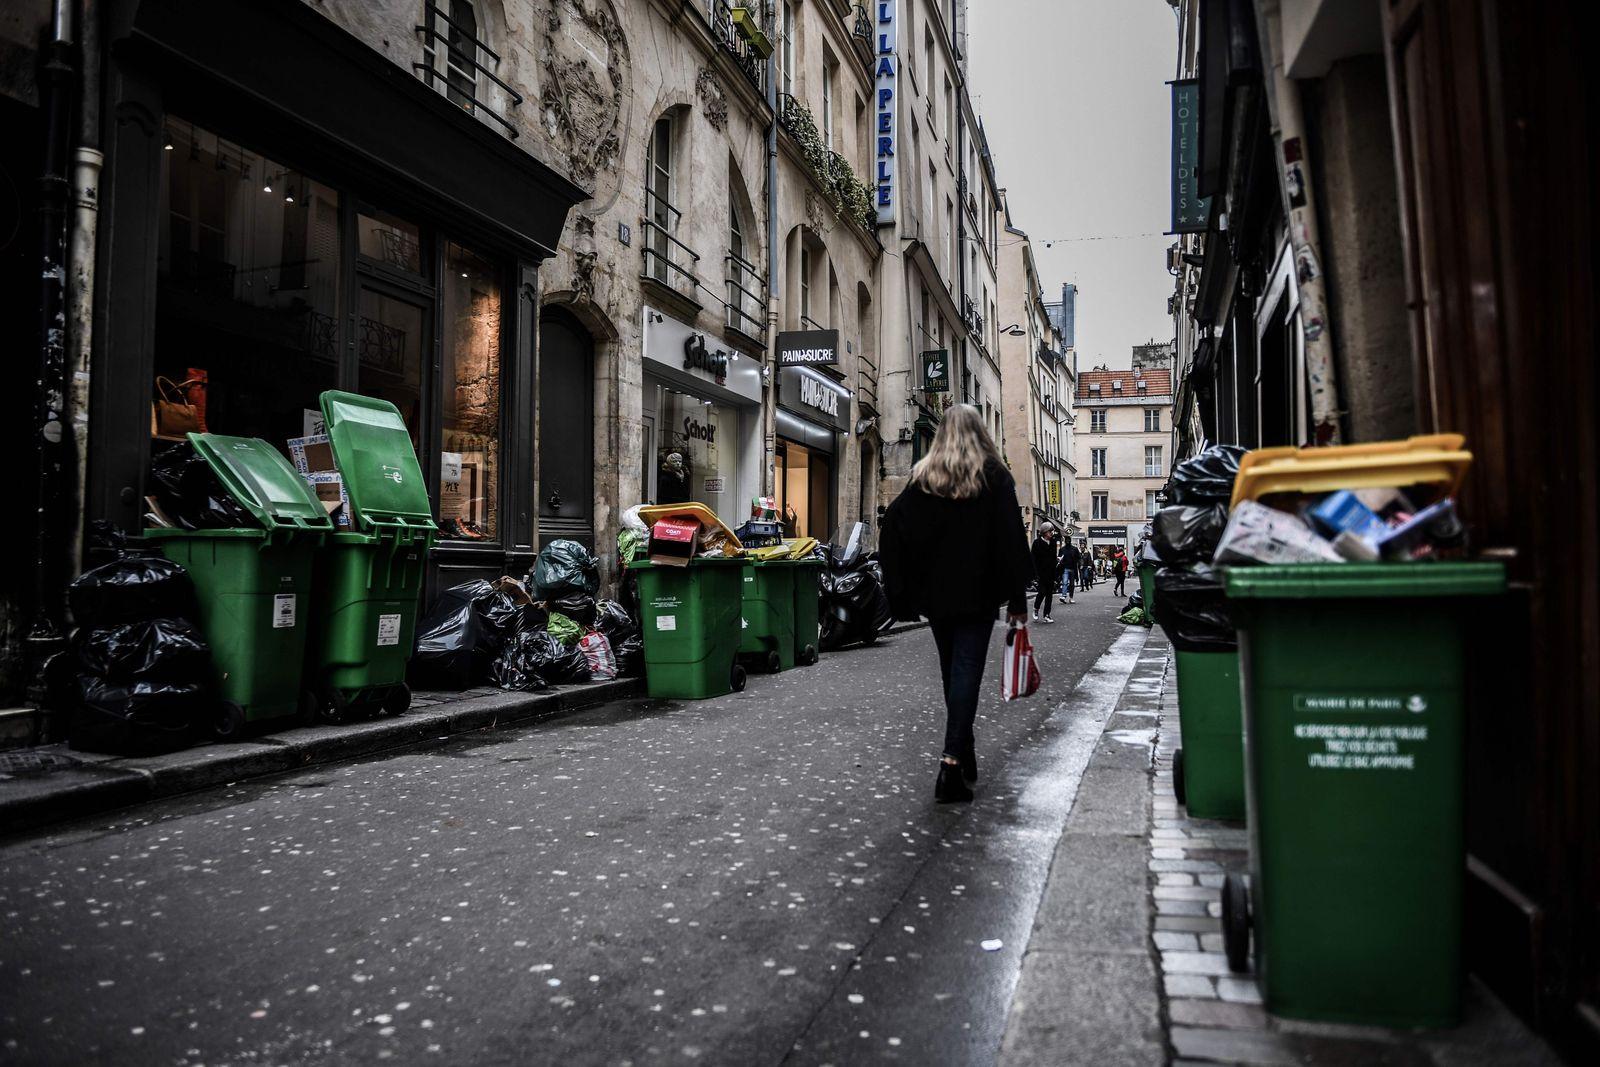 FRANCE-POLITICS-PENSIONS-STRIKE-GARBAGE